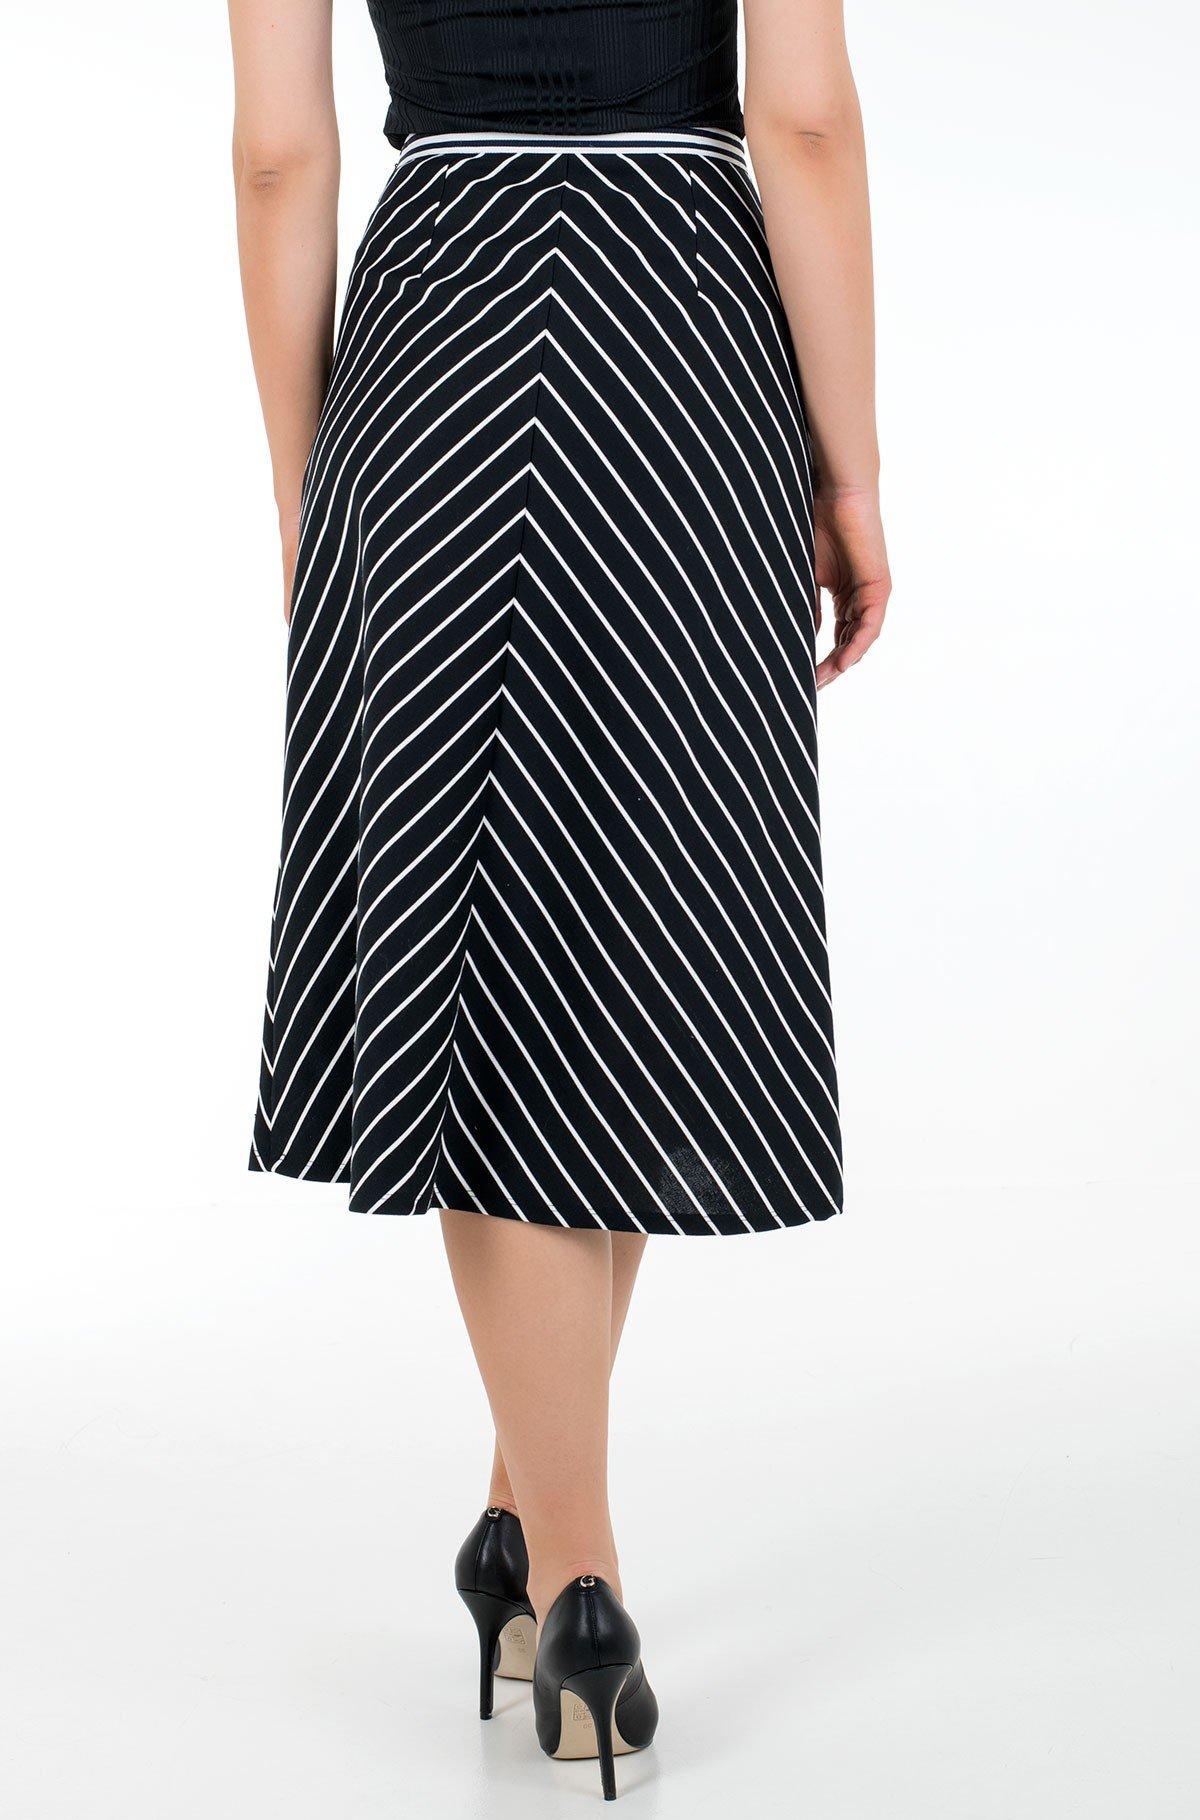 Skirt PINSTRIPE MILANO F&F MIDI SKIRT-full-2